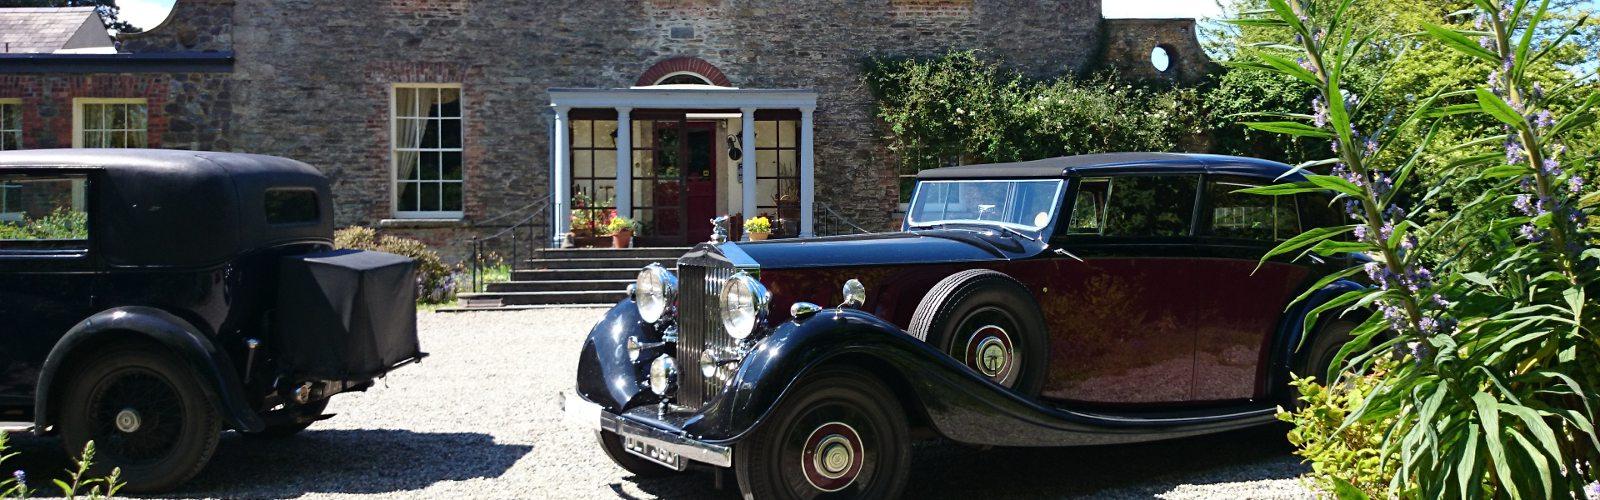 Weddings at Kilmokea Country Manor, New Ross, Wexford